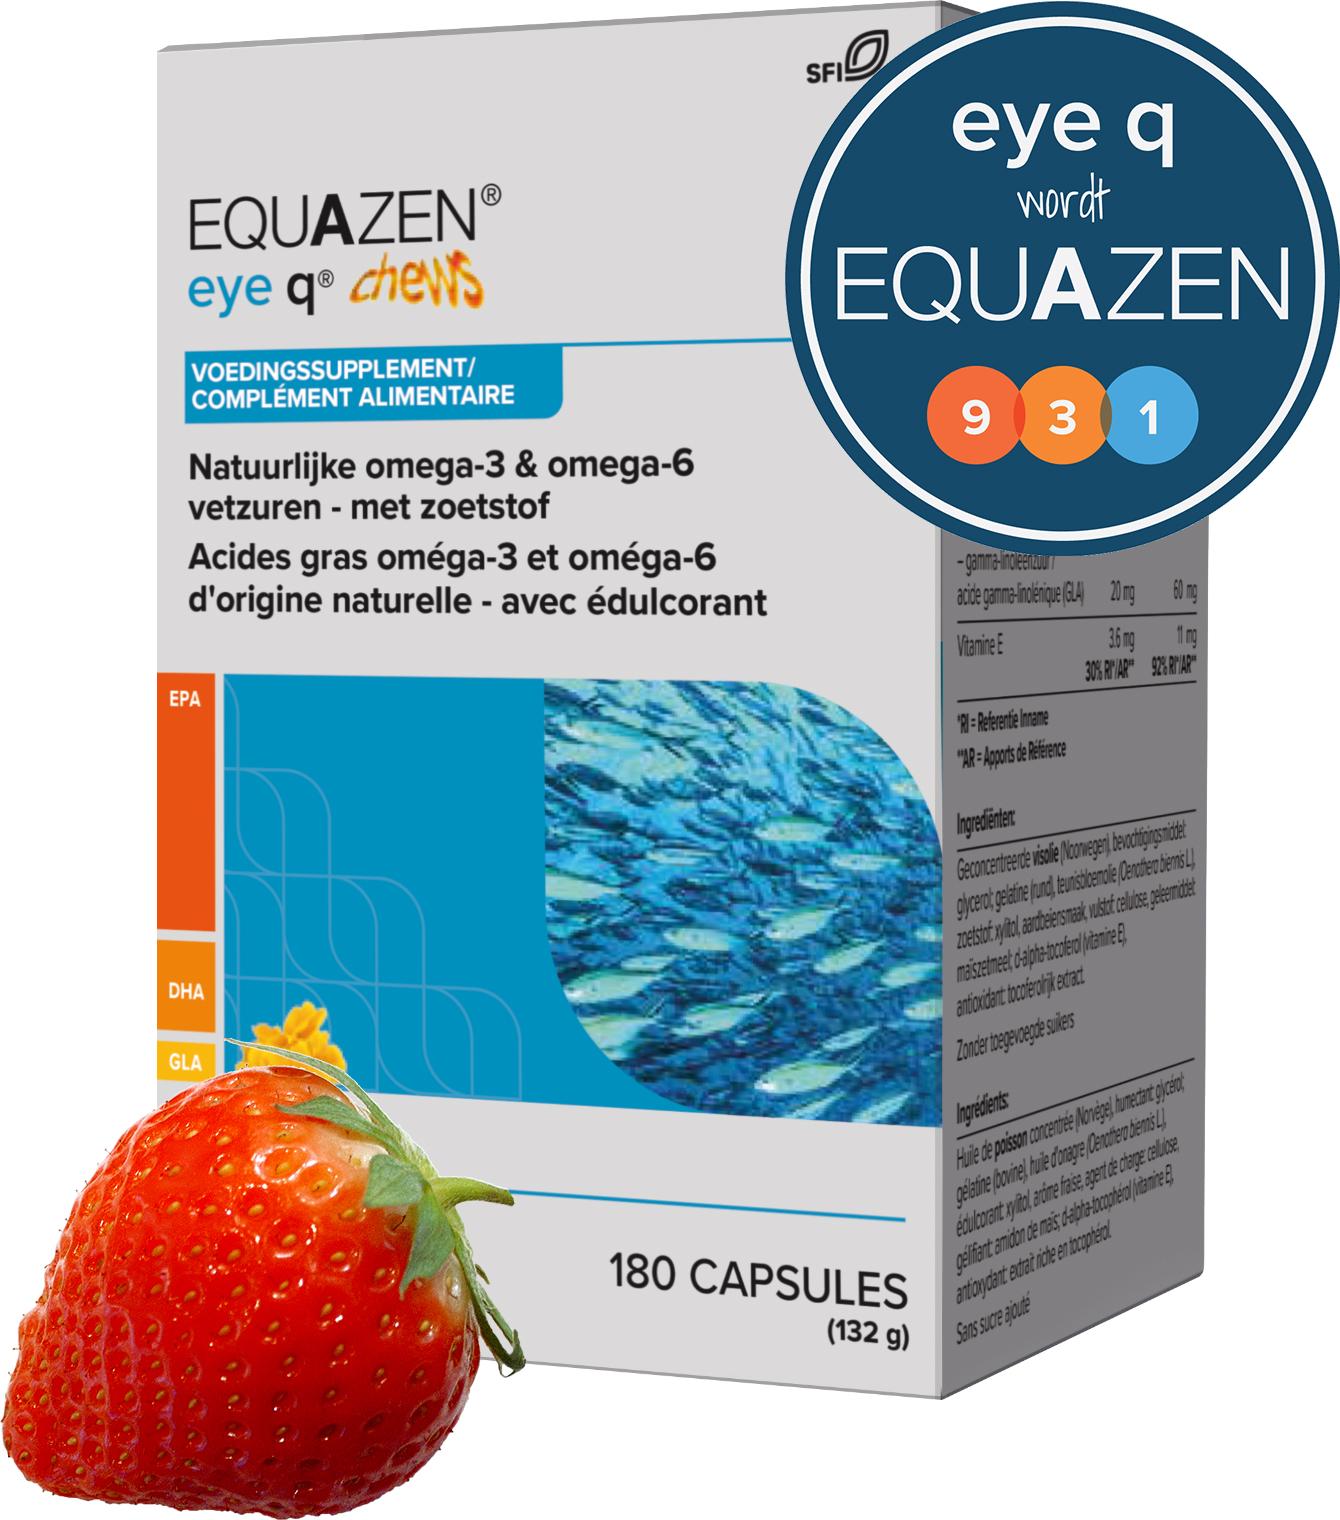 Equazen 9.3.1 Chews - EPA, DHA, GLA - kauwcapsules met aardbeiensmaak - eye q wordt equazen